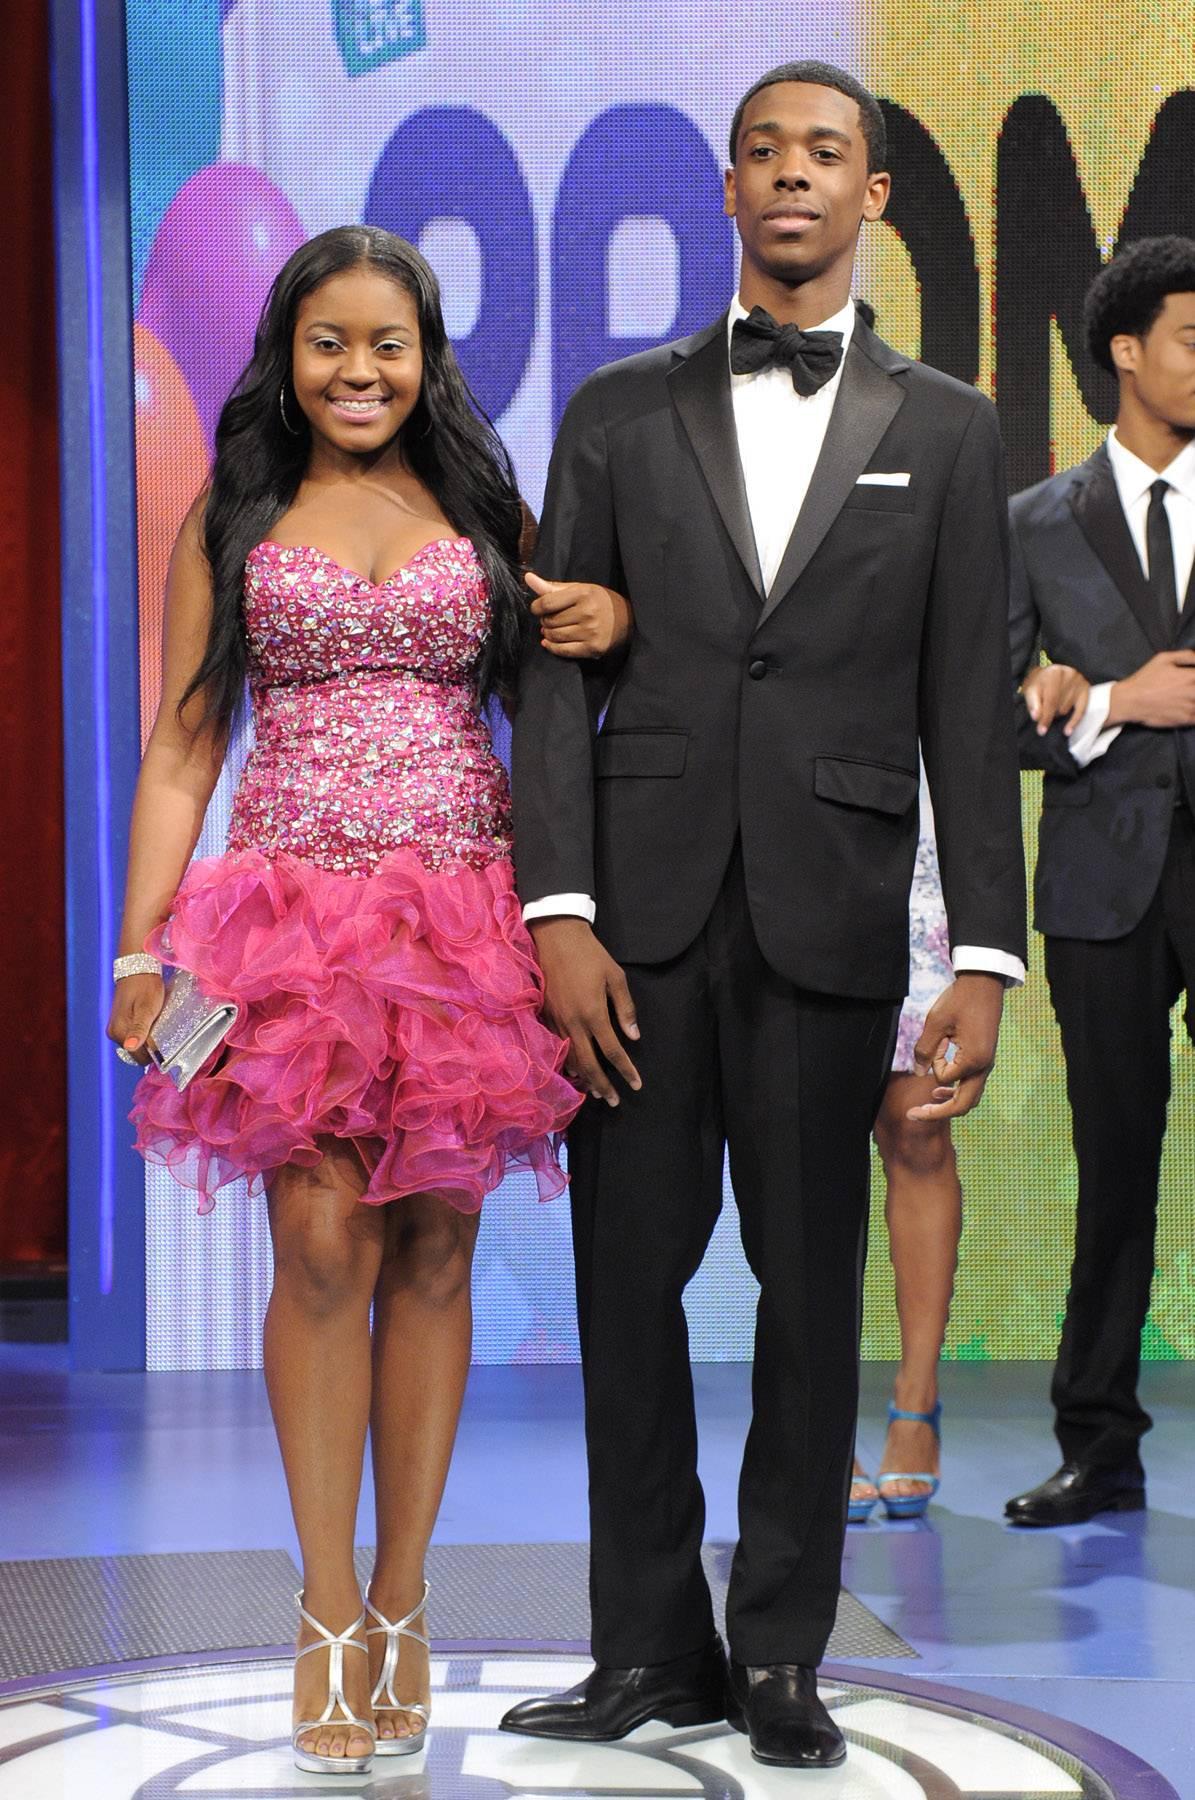 Coupled up - Prom Night fashion show at 106 & Park, May 16, 2012. (Photo: John Ricard / BET)